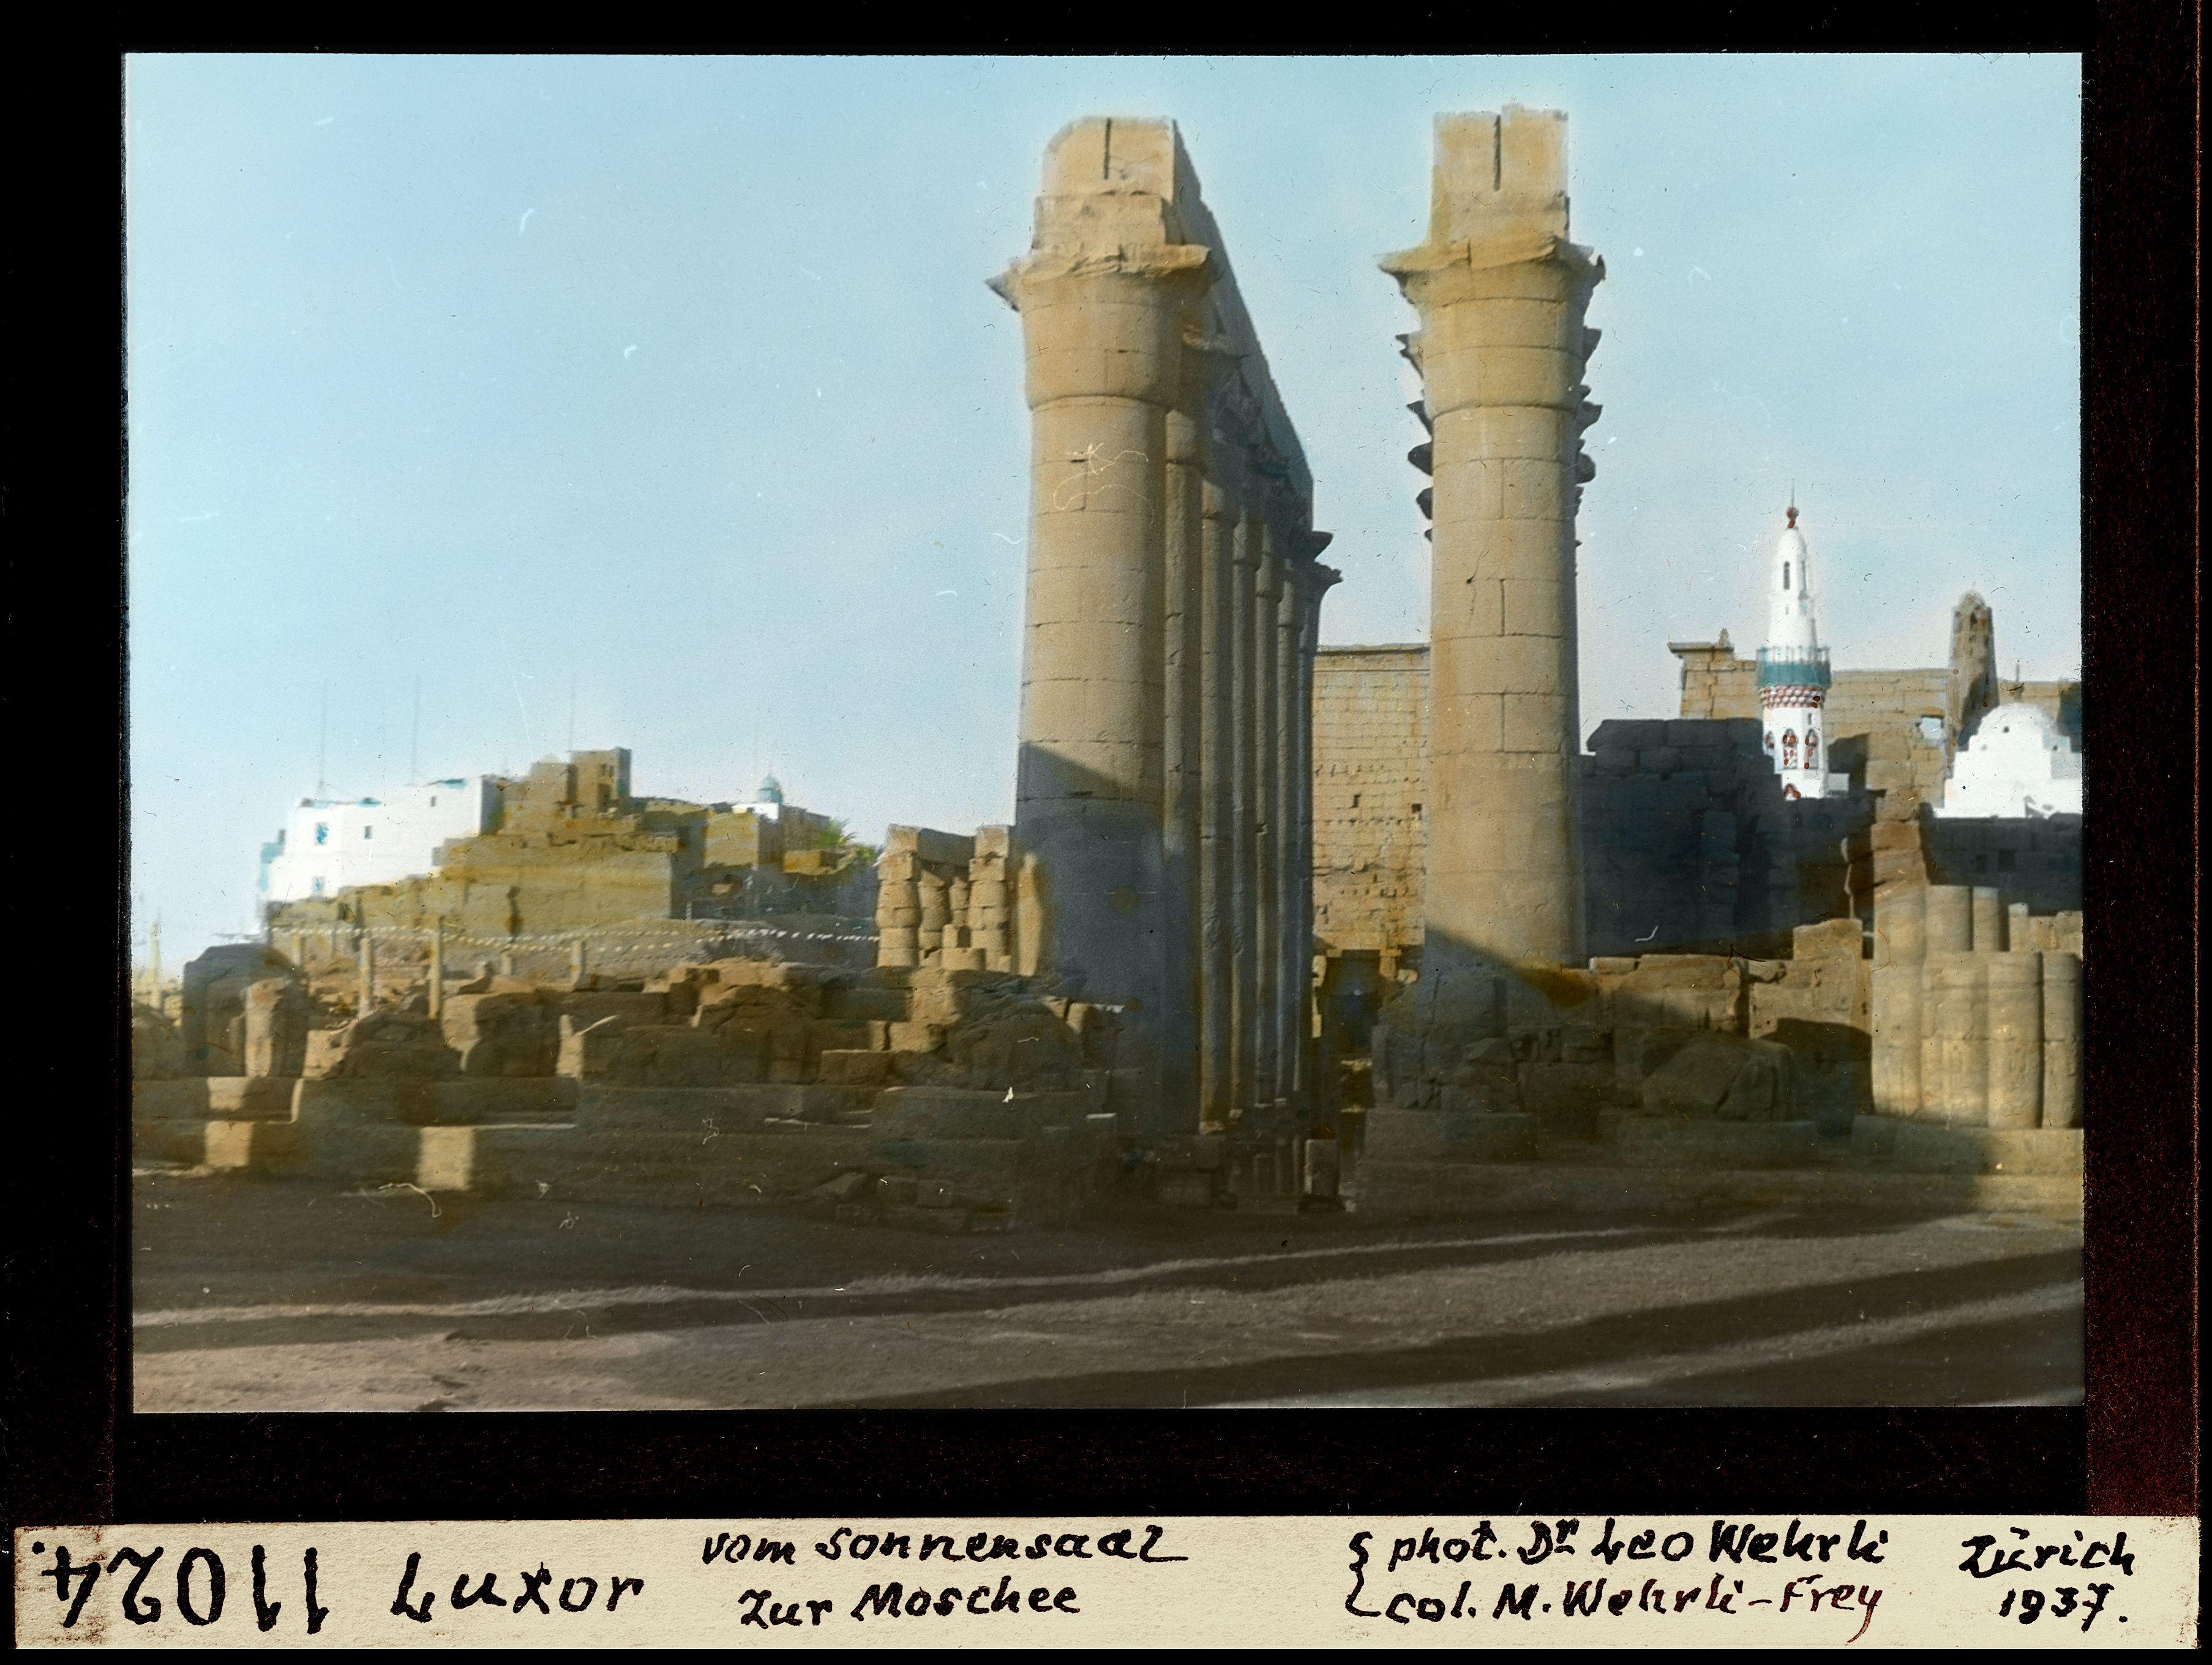 Вид мечети от Солнечной комнаты луксорского храма